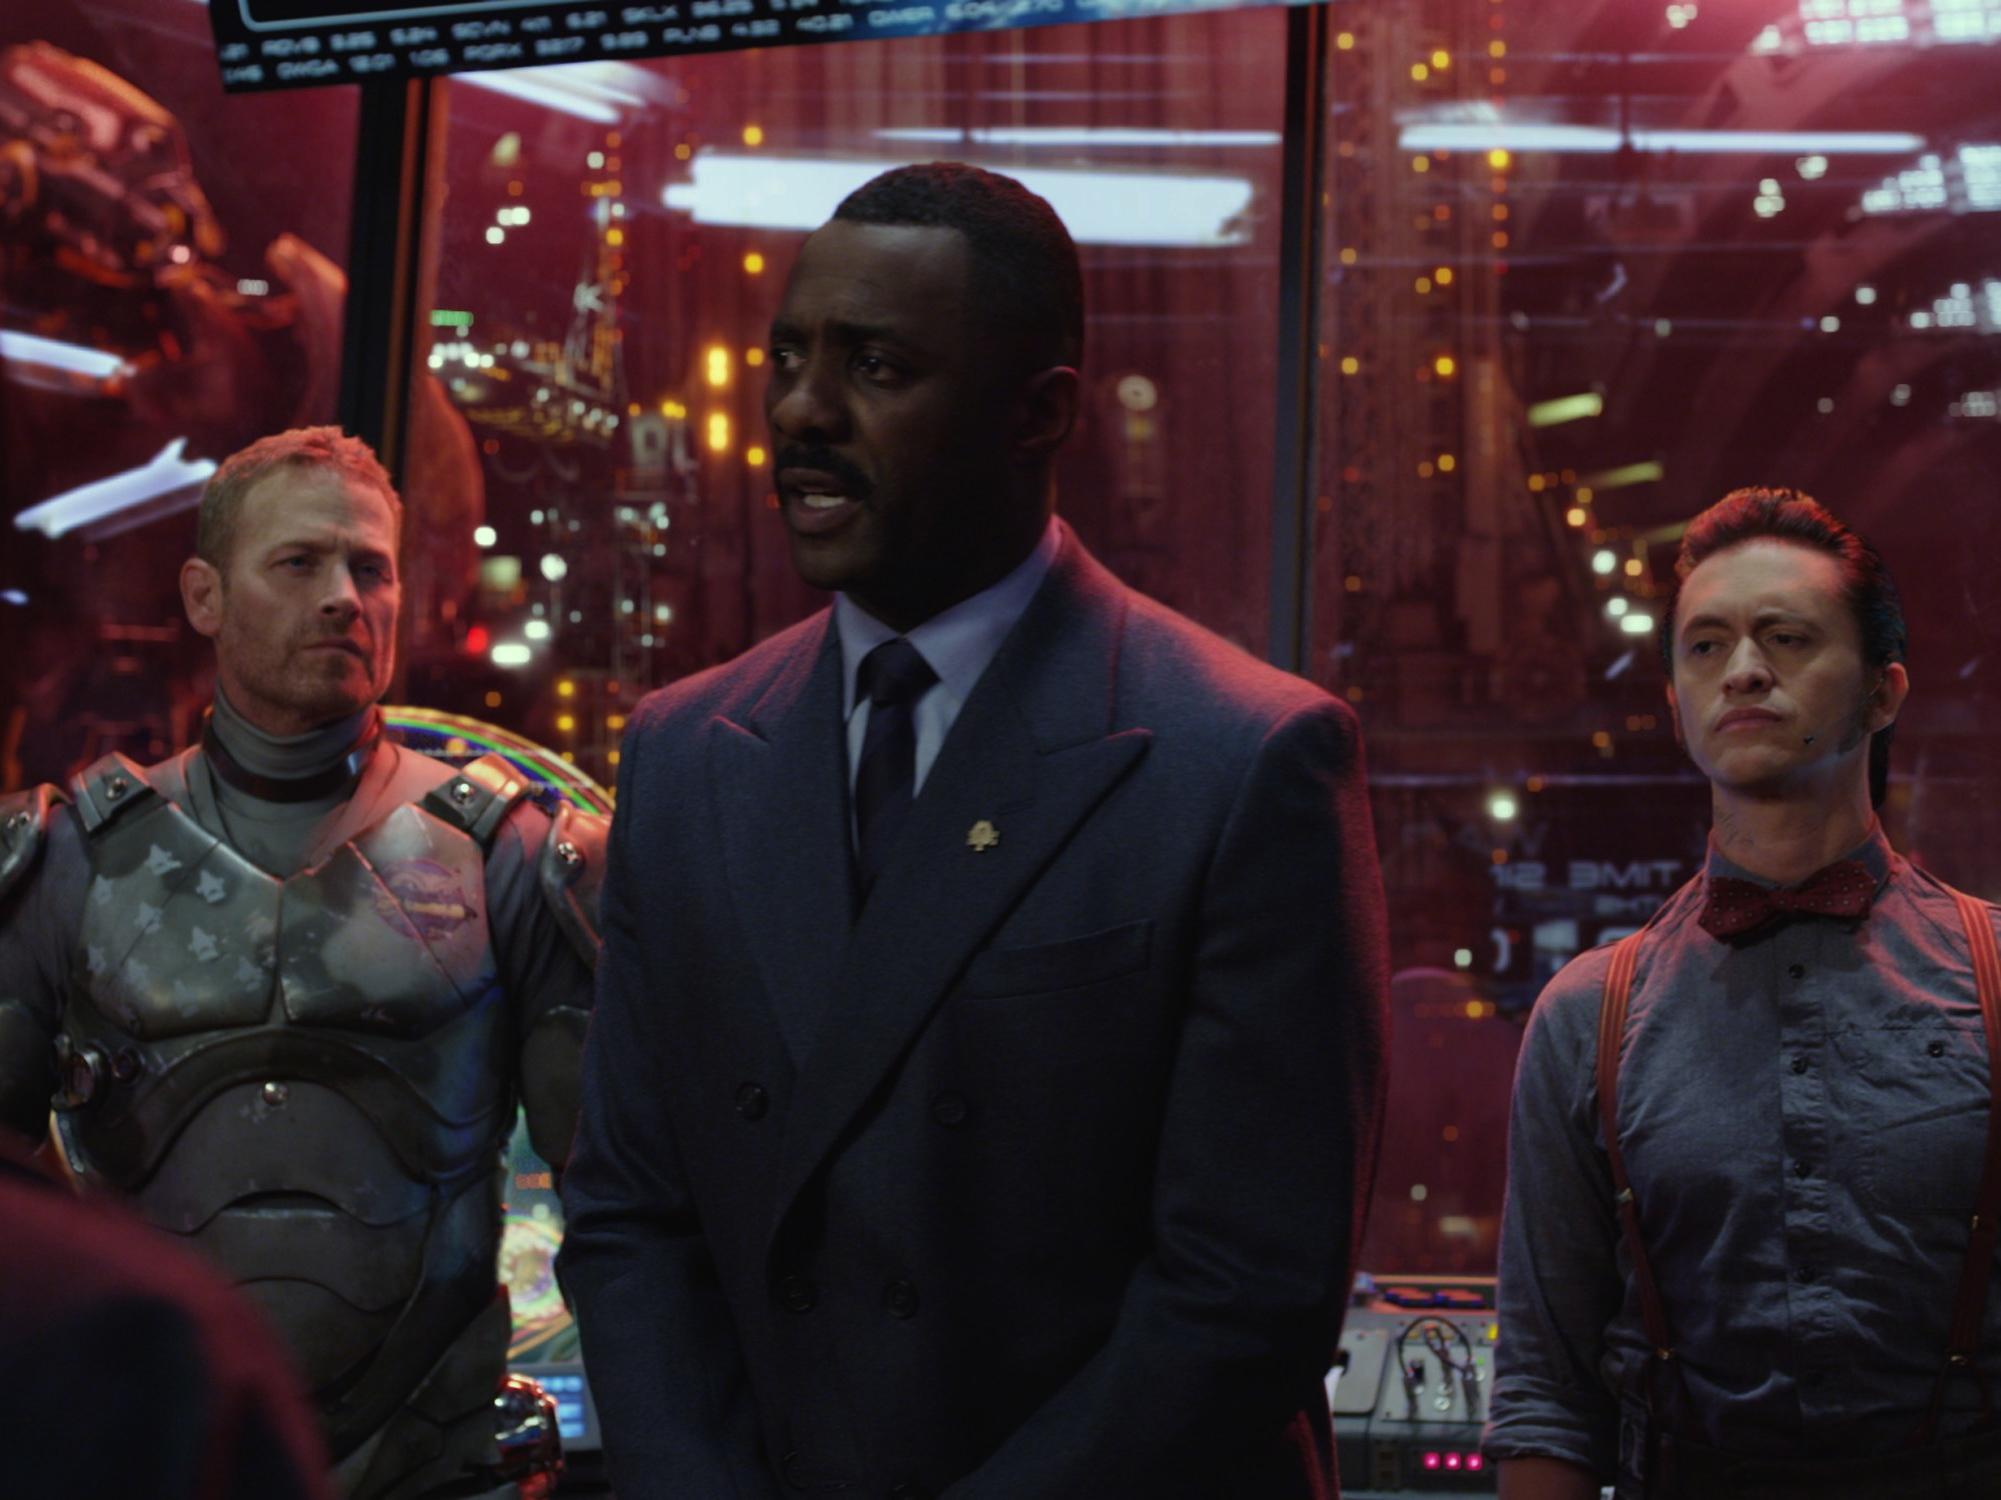 Ten great British action heroes, Pacific Rim..Max Martini as Herc Hansen; Idris Elba as Stacker Pentecost; Clifton Collins Jr. as Ops Tendo Choi.... 2013 Warner Brothers